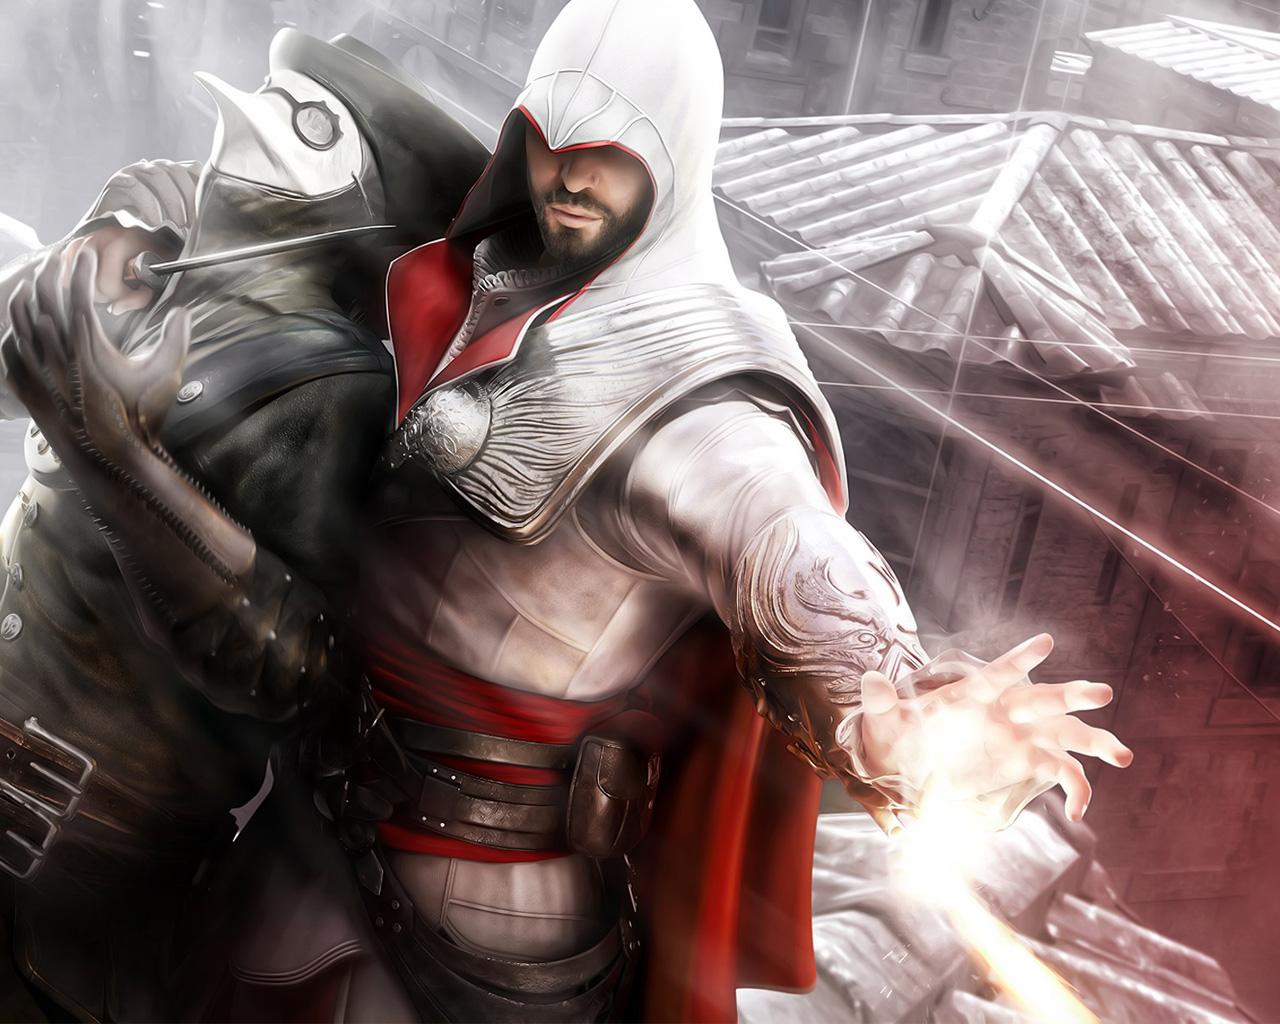 Assassin's Creed: Brotherhood Wallpaper in 1280x1024